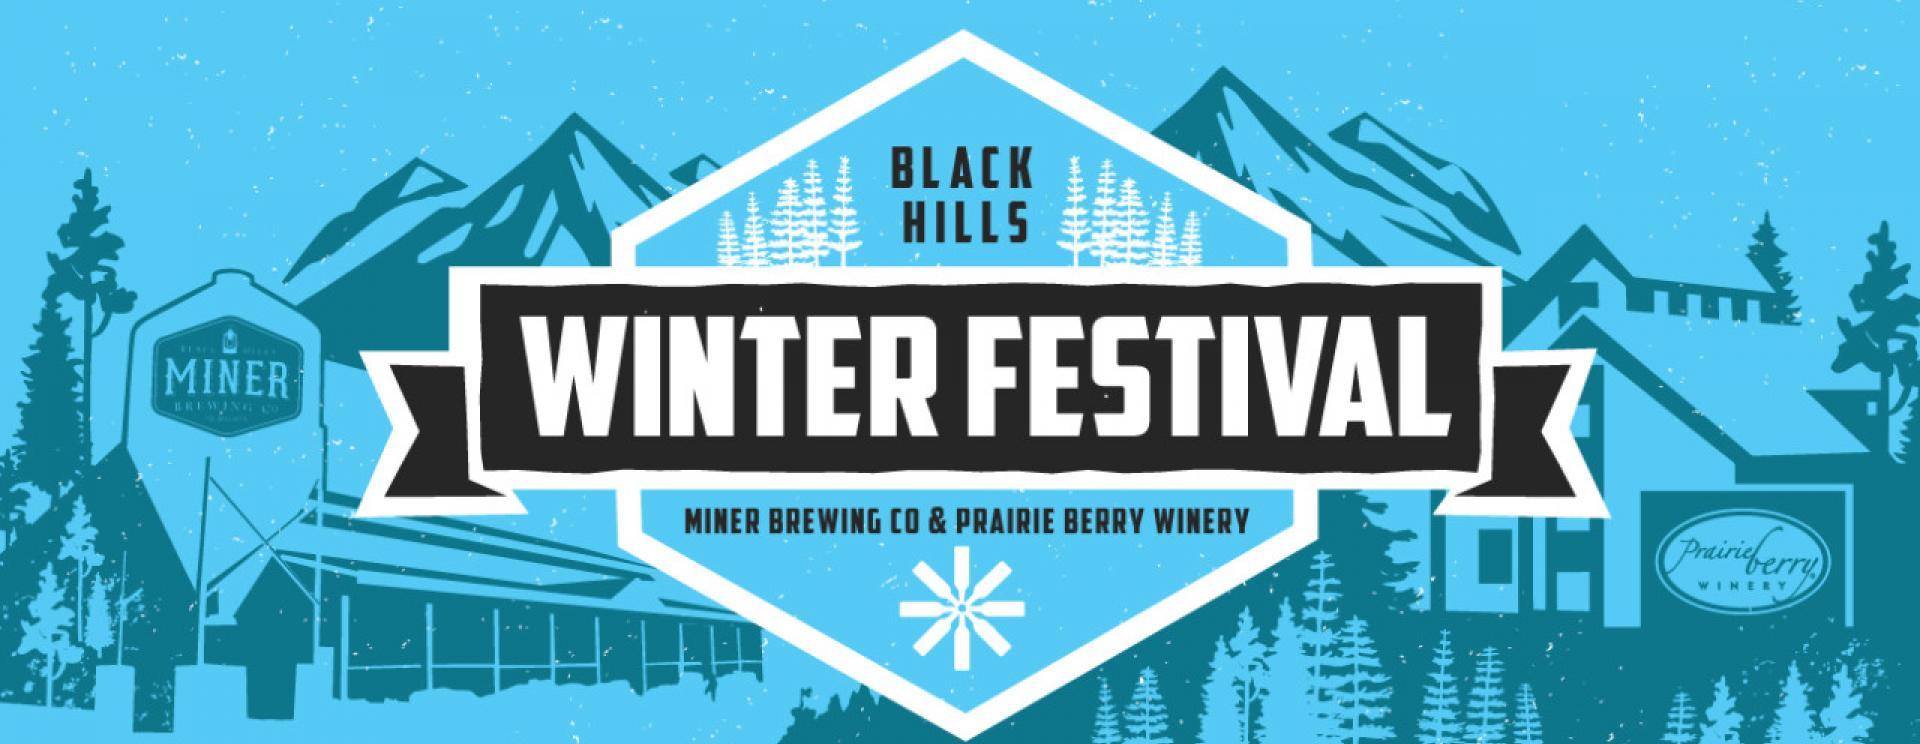 Black Hills Winter Festival